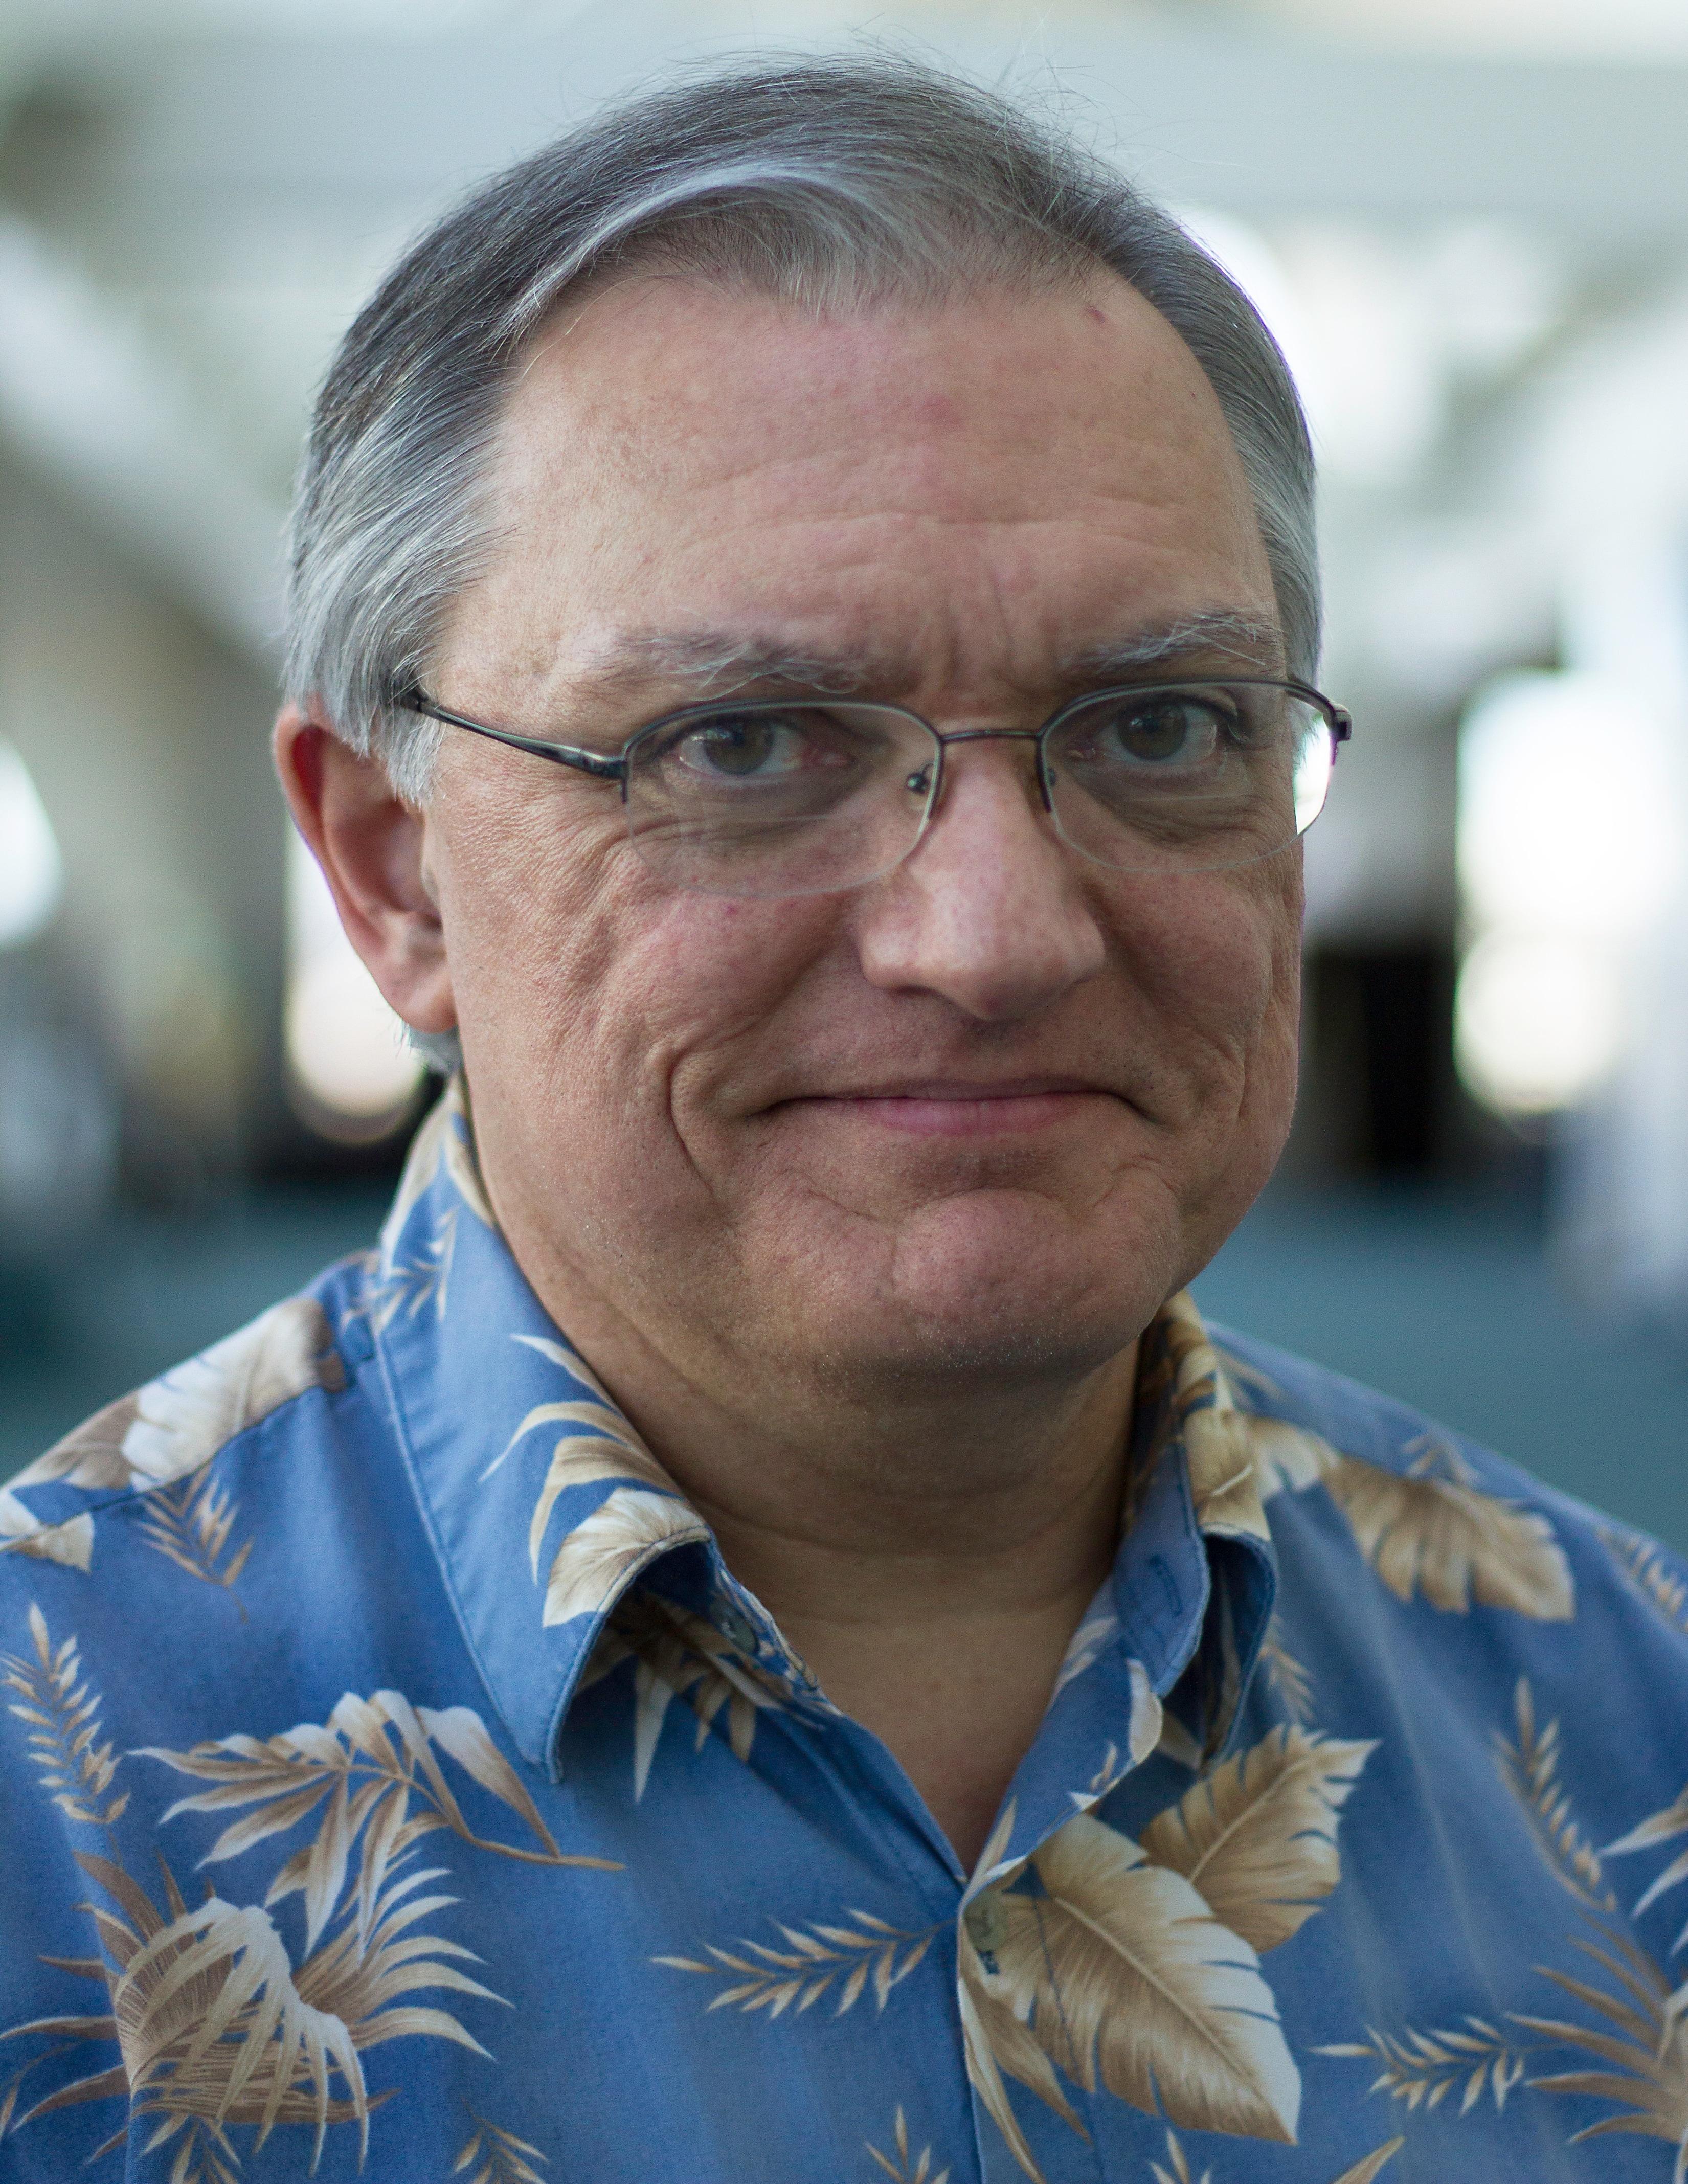 Steve Stiles is a journalist for Medscape Medical News